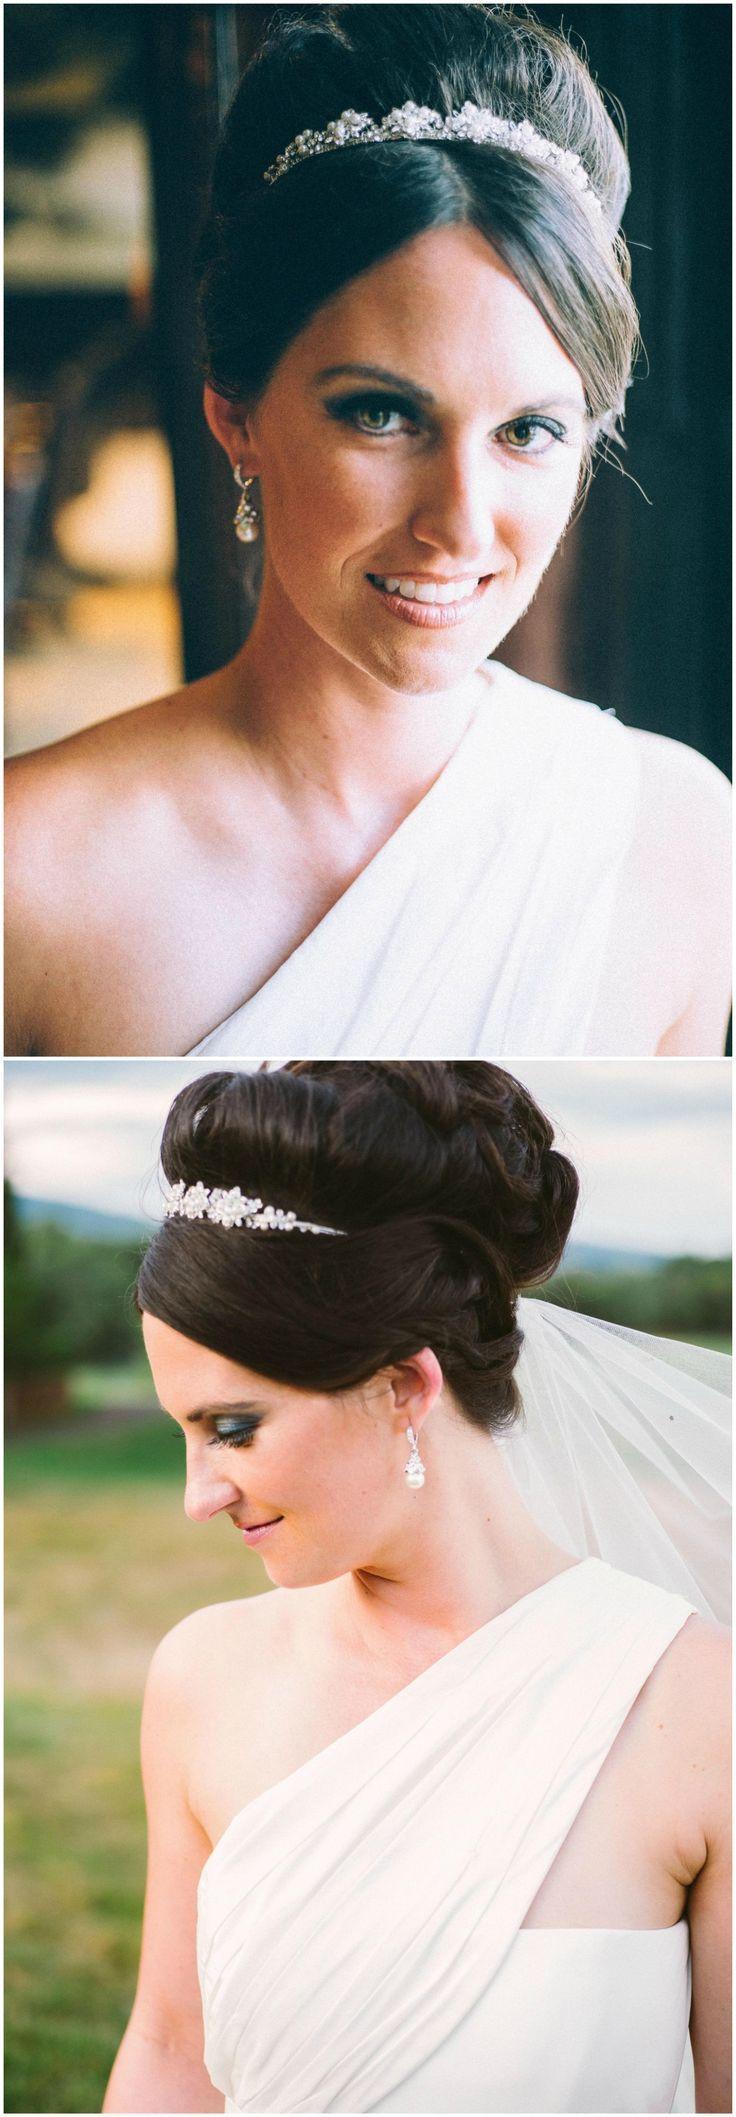 Formal bridal hairstyle, elegant wedding up-do, smoky eye, pearl drop earrings, glam headband // Sam Stroud Photography - New Site - #bridal #elegant ...